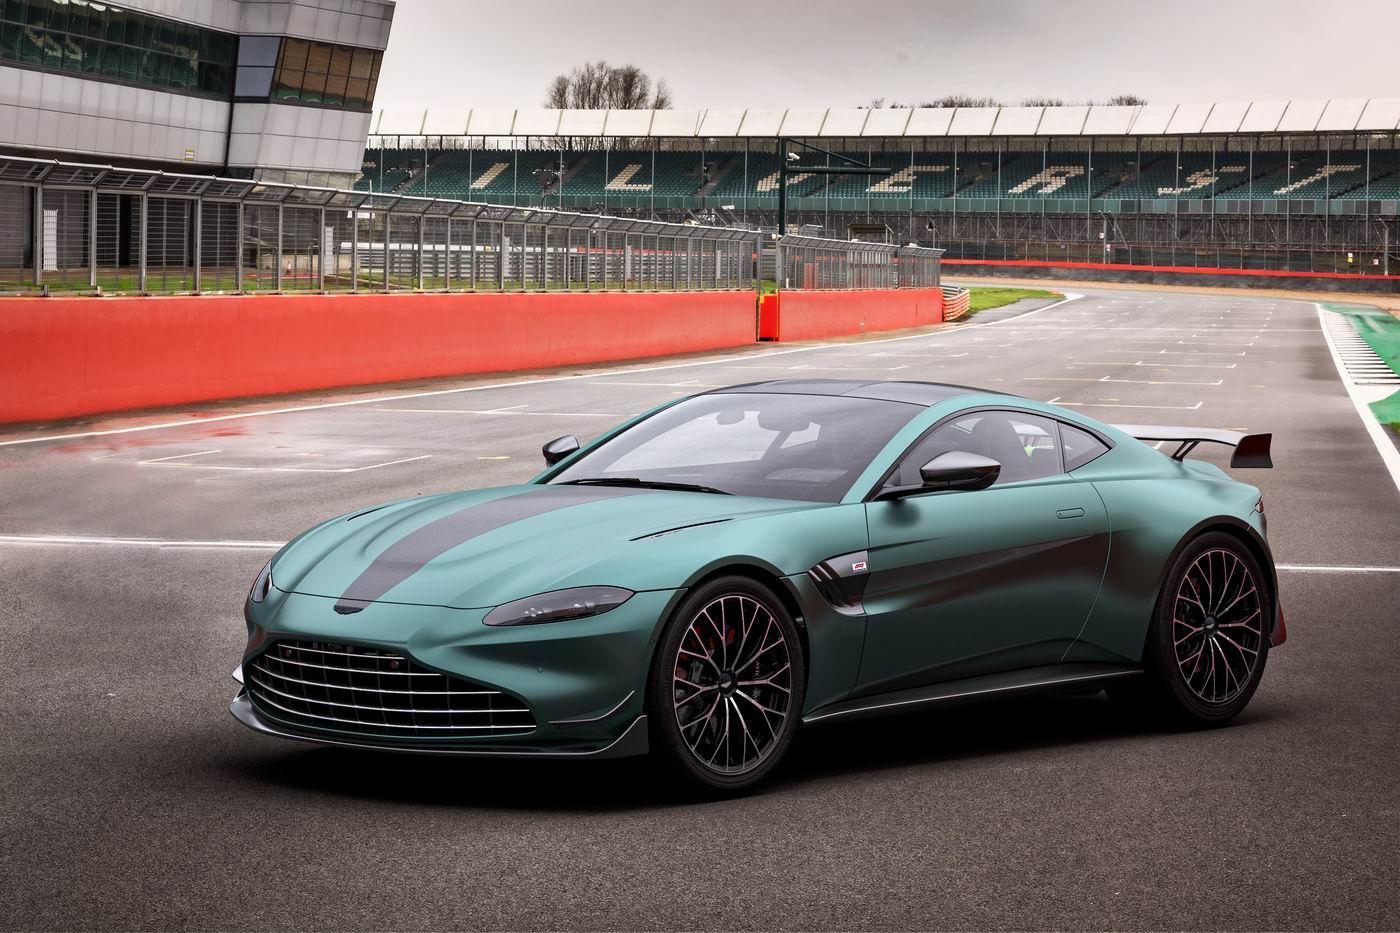 Introducing The 2022 Aston Martin Vantage F1 Edition